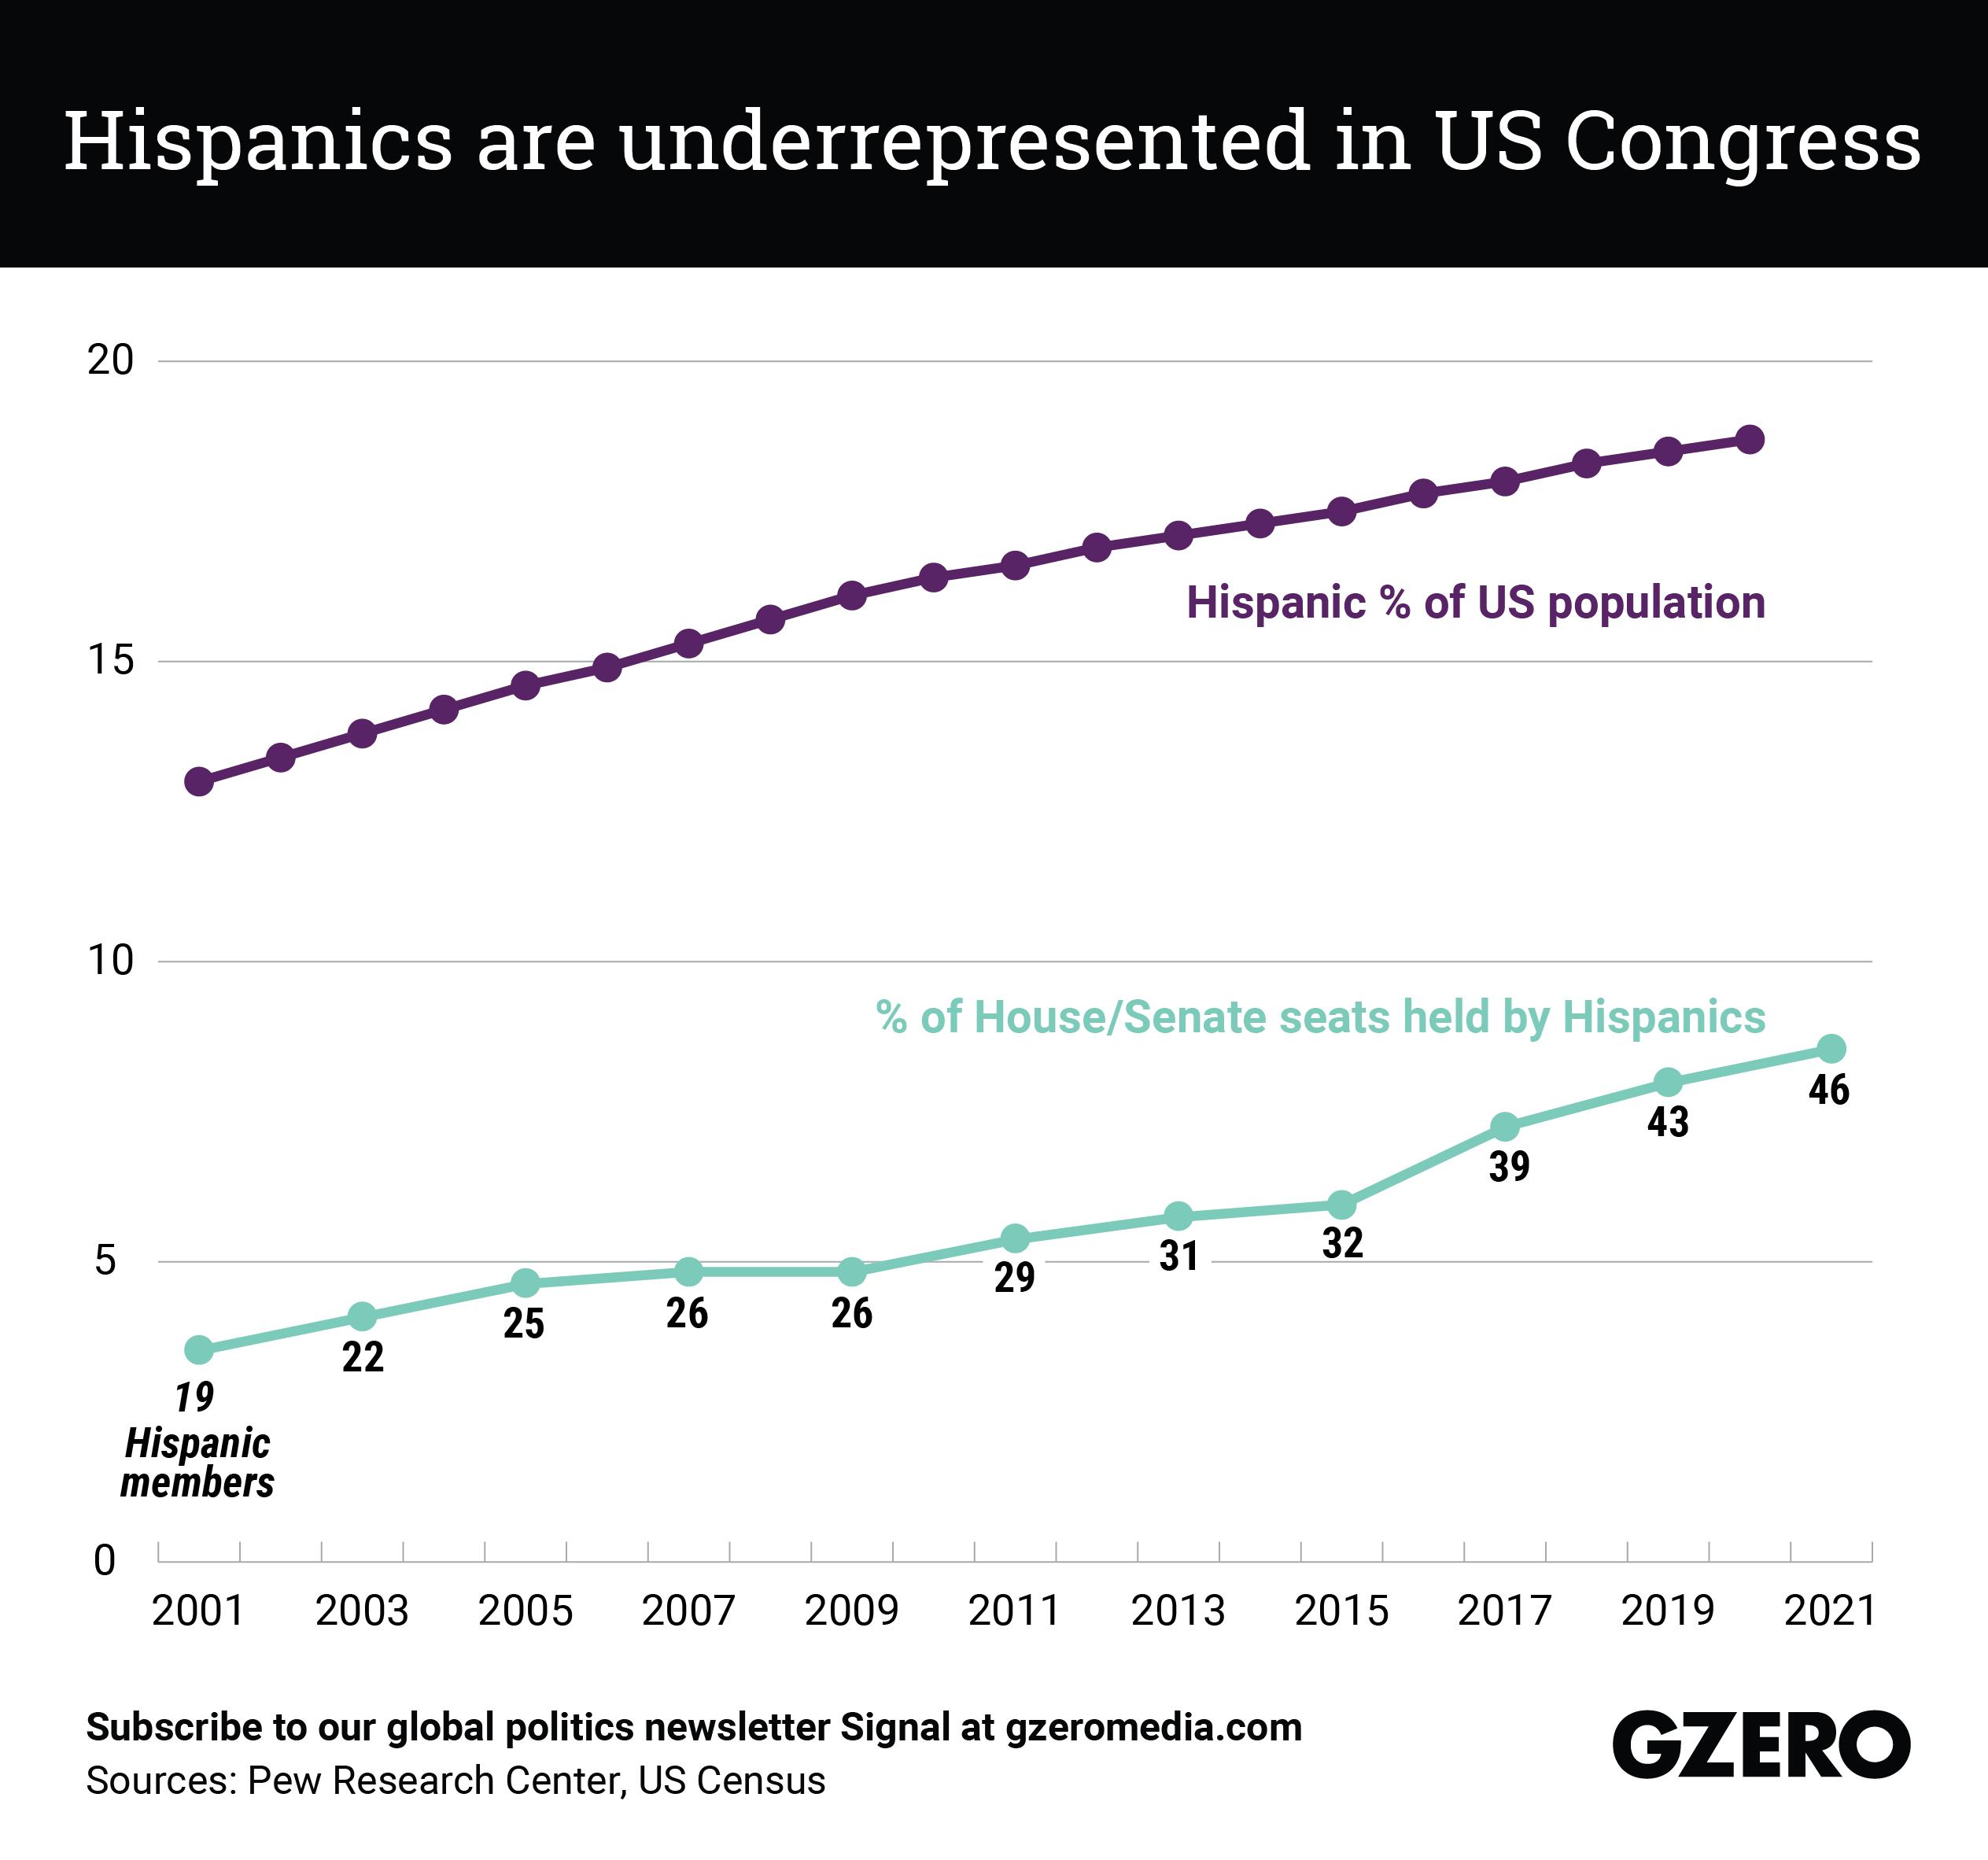 The Graphic Truth: Hispanics are underrepresented in US Congress